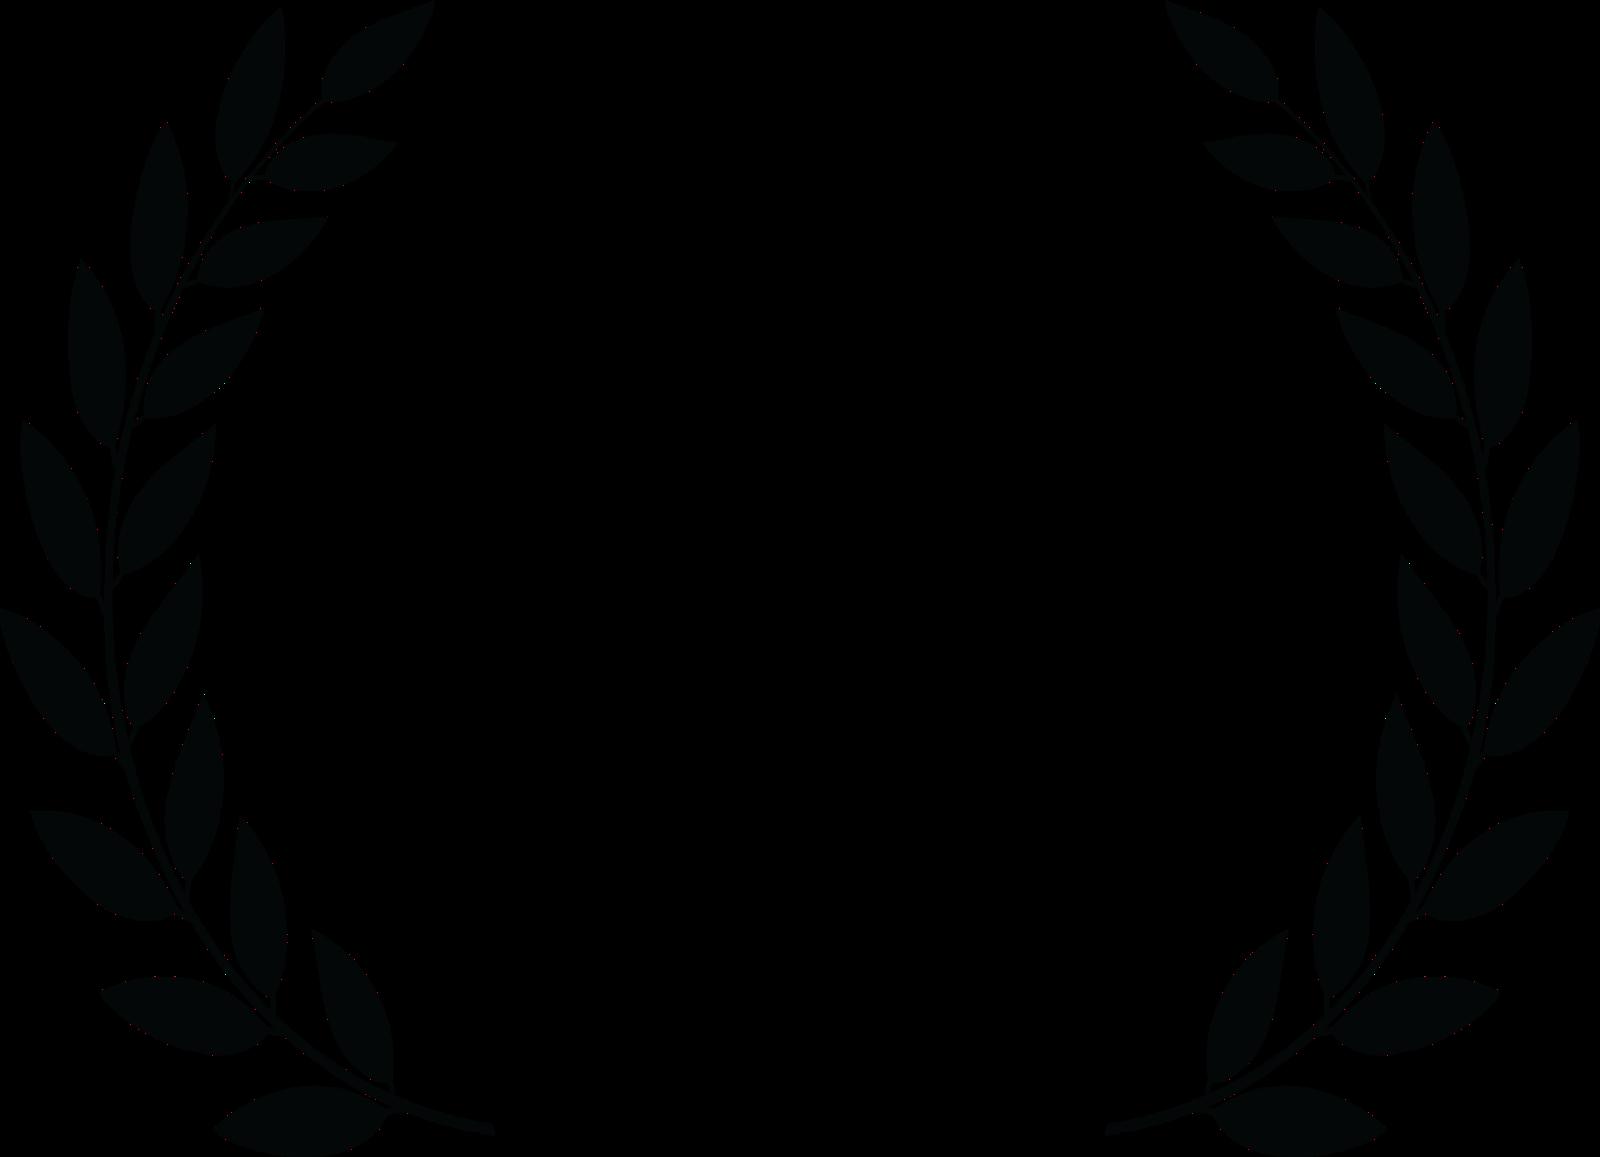 Indie Film Technique Indie Independent Film Filmmaking Production Indie Movie Posters Film Technique Independent Filmmaking